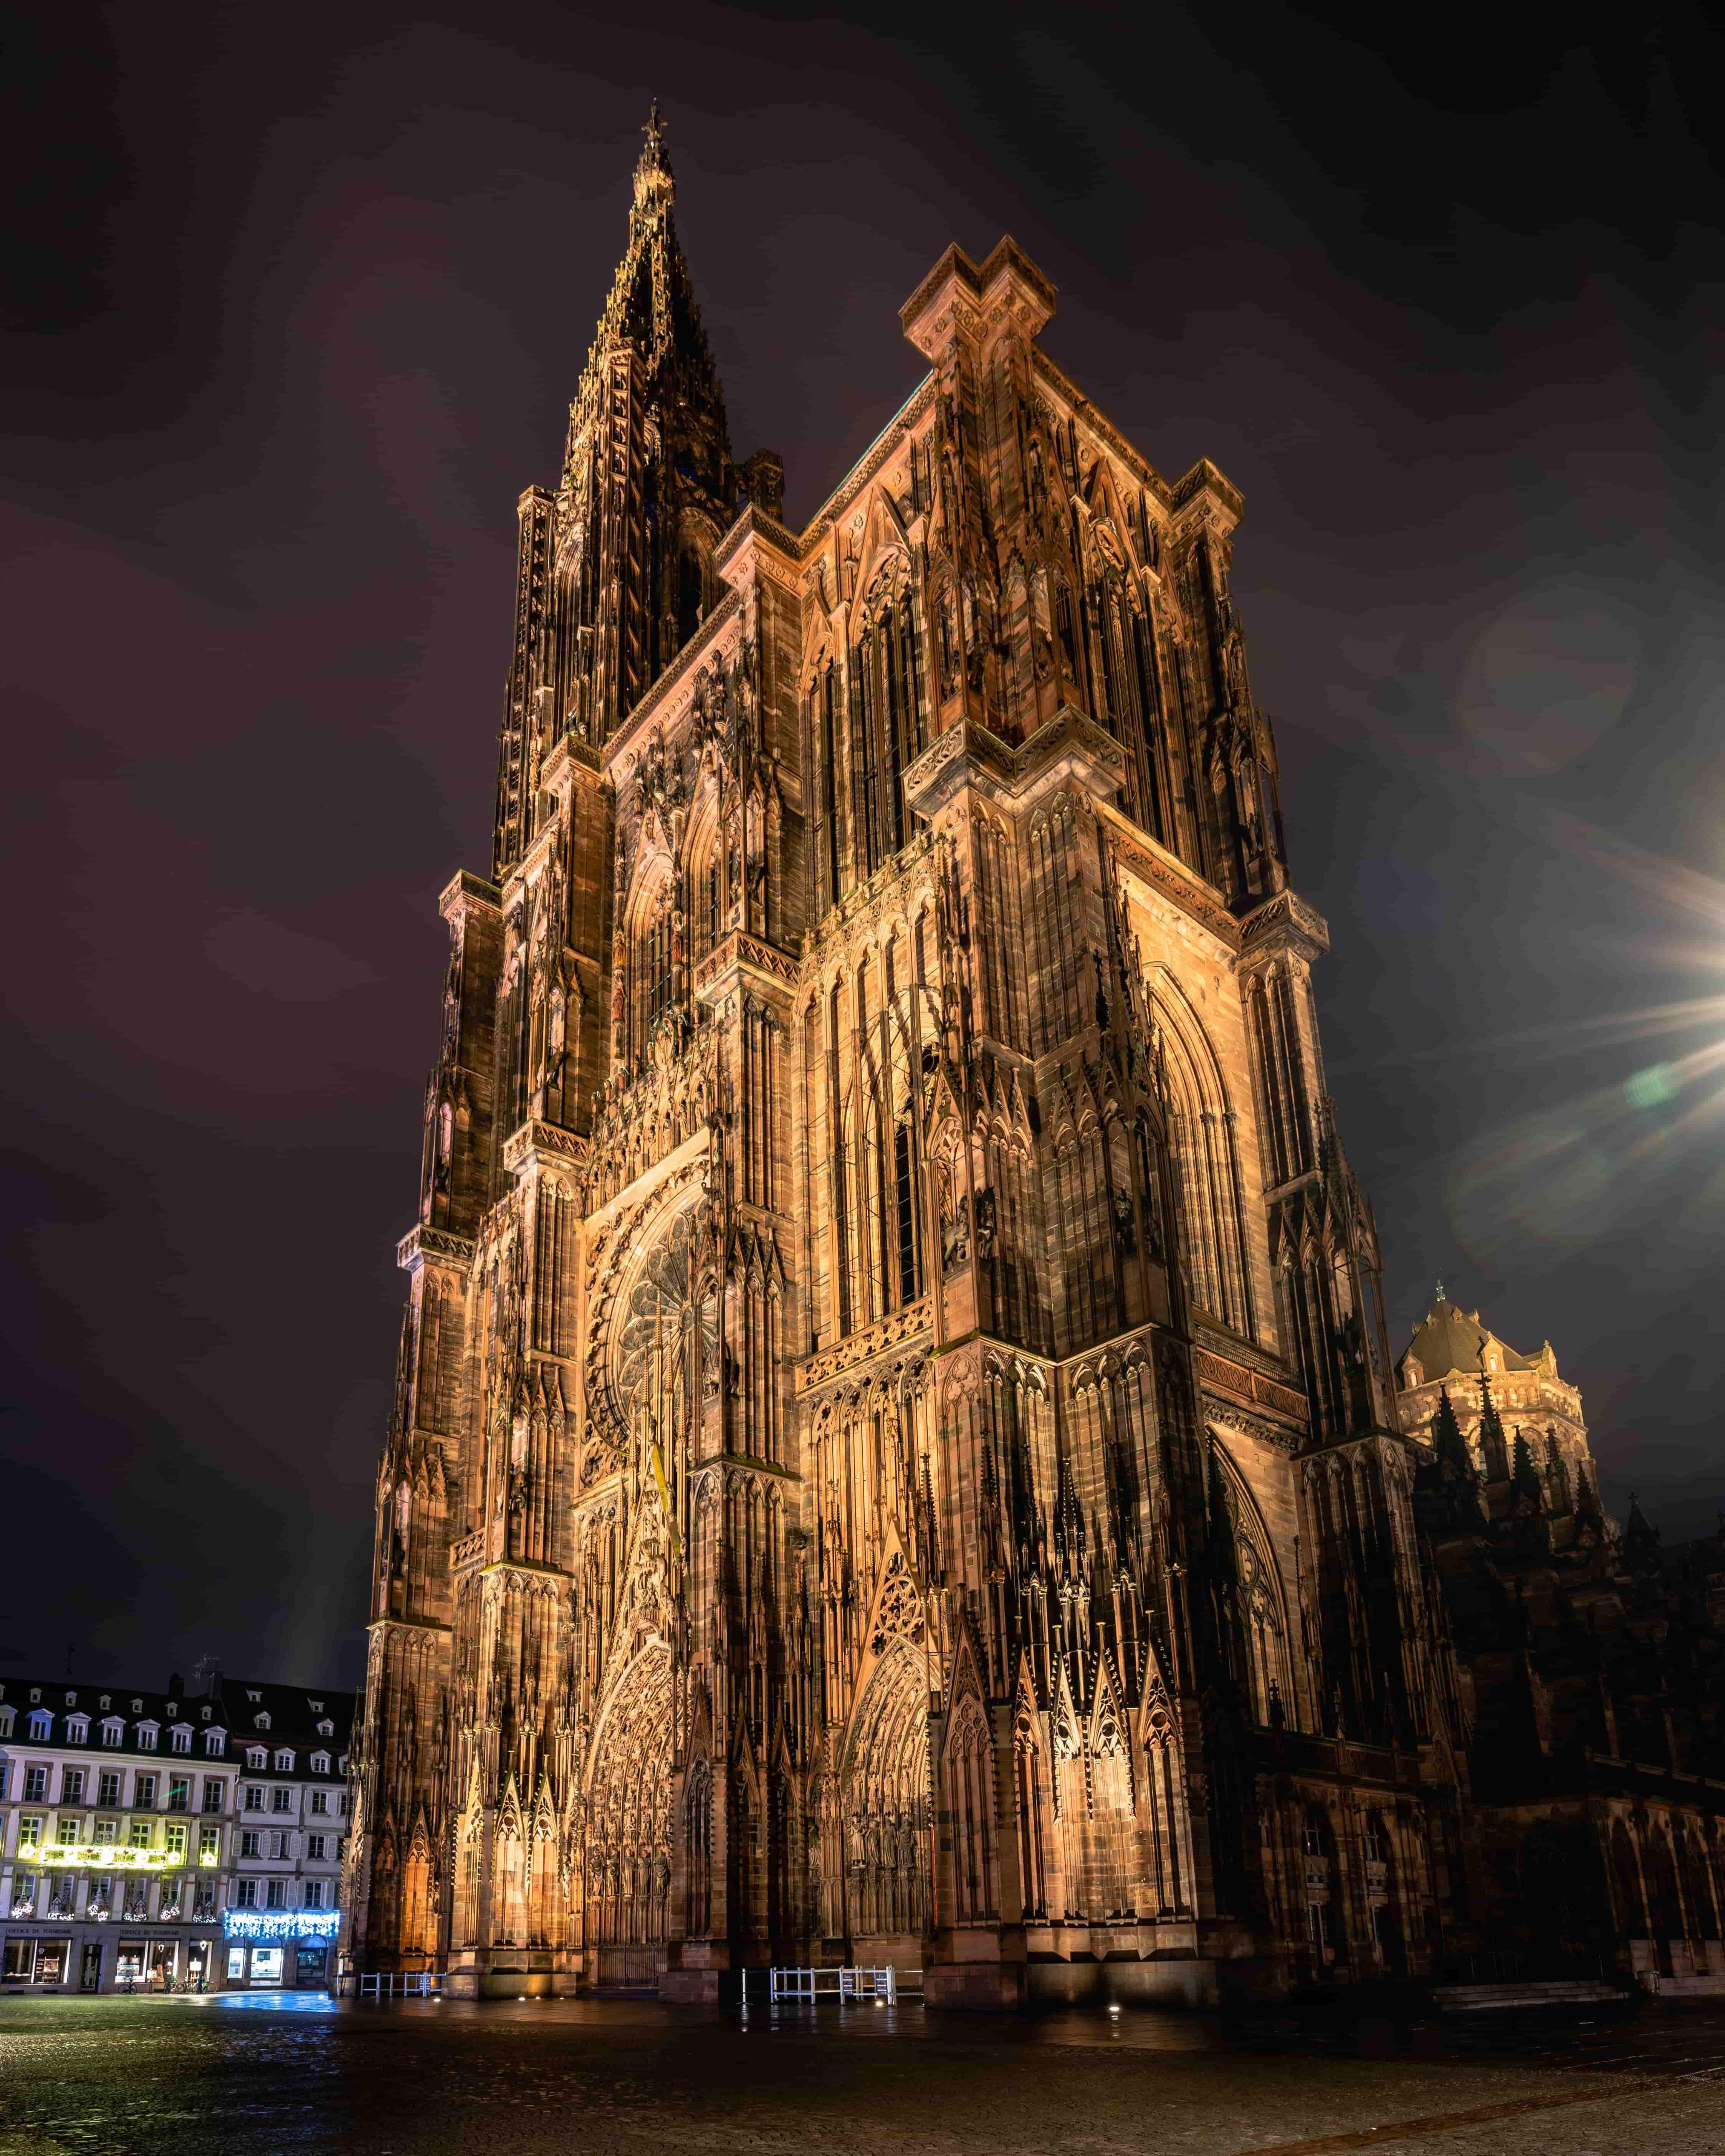 https://apps.tourisme-alsace.info/photos/strasbourg/photos/223012489_1.jpg